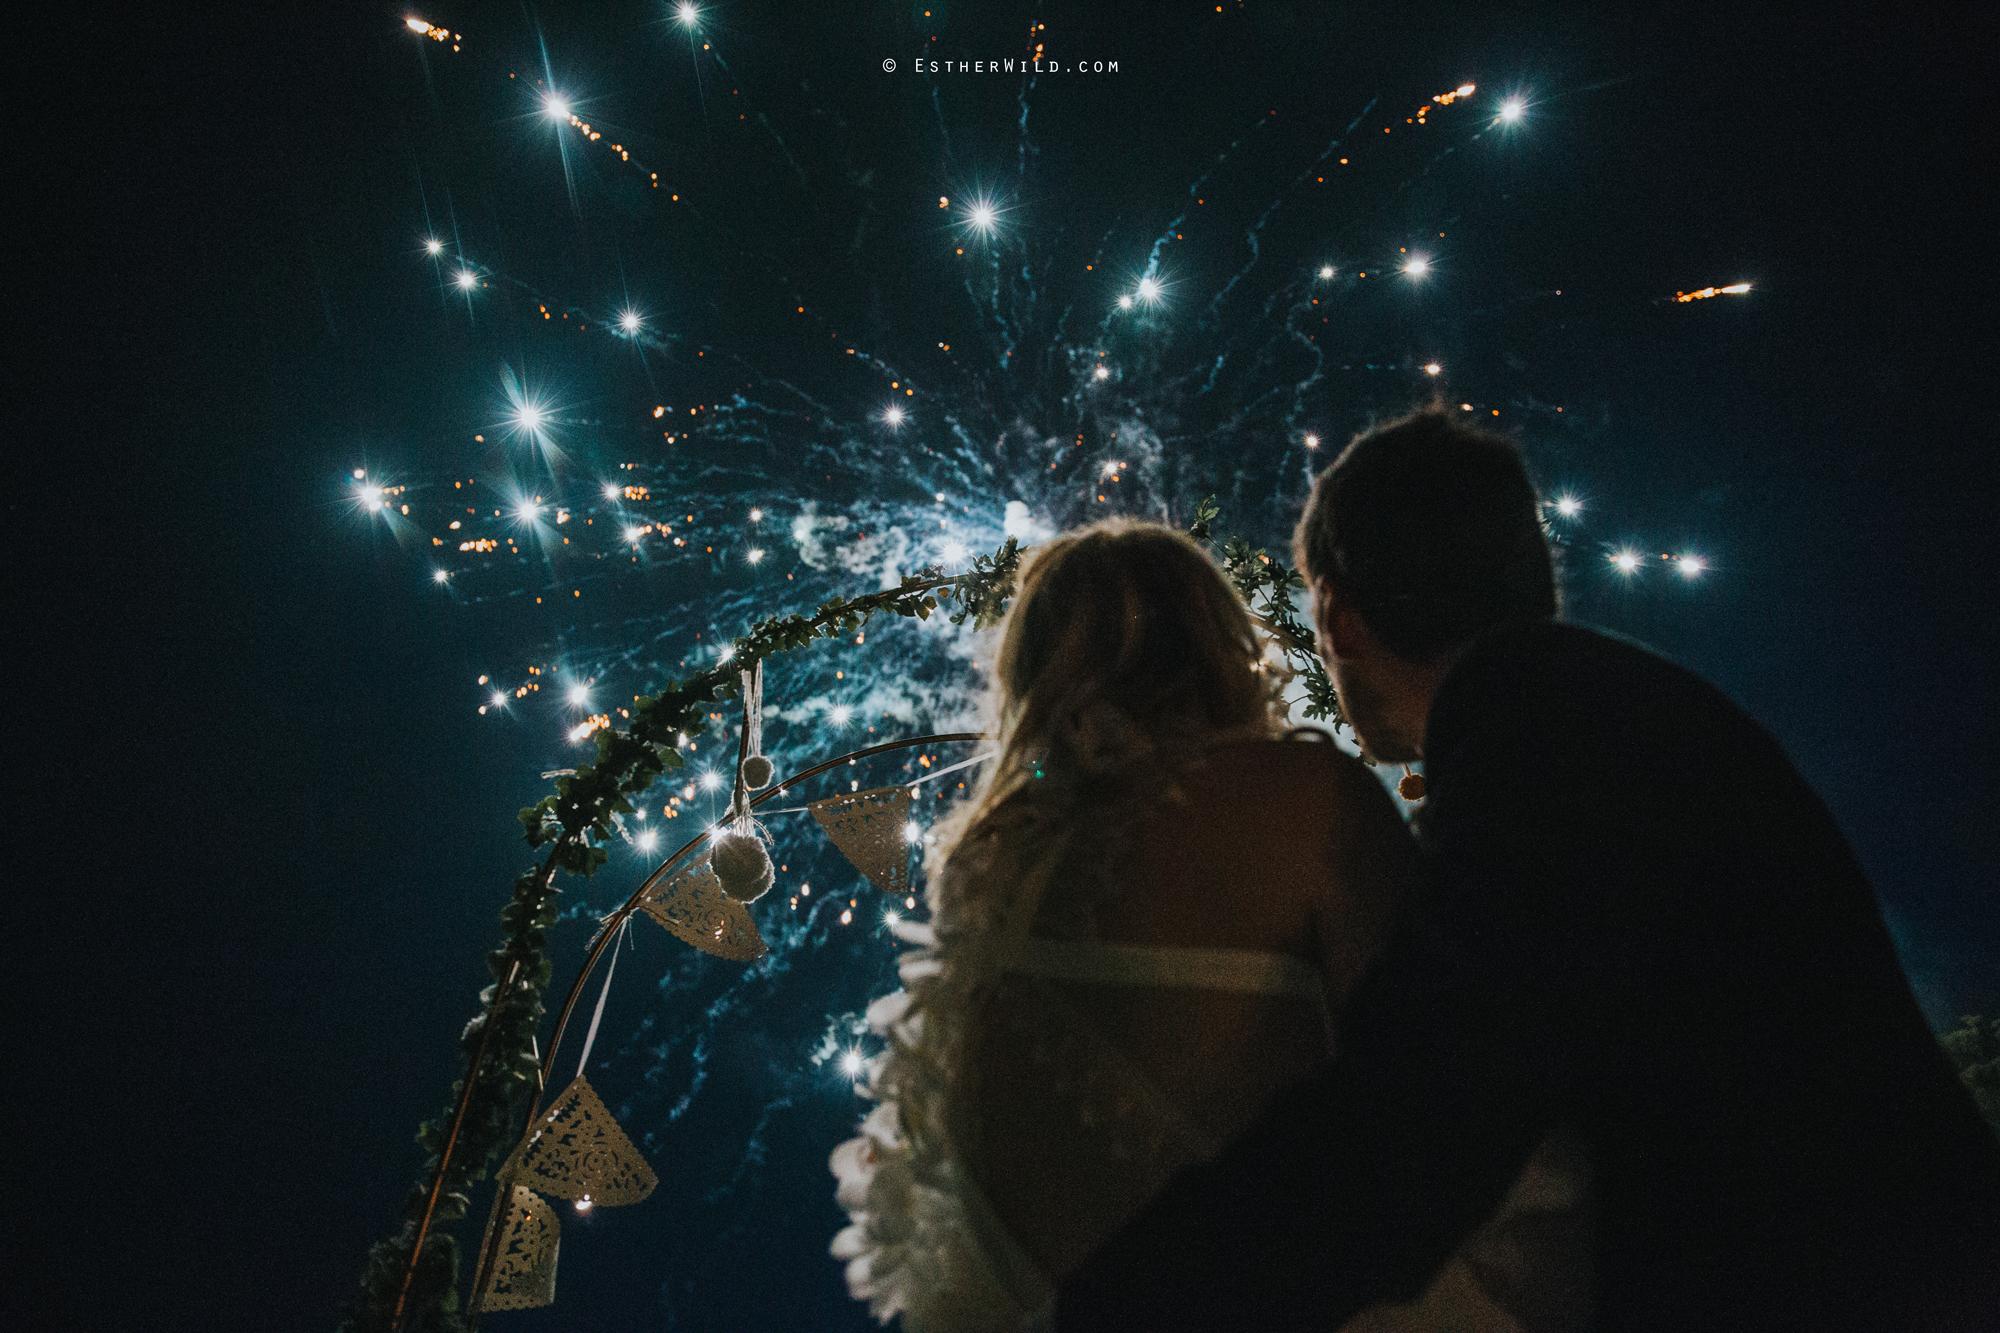 IMG_3539Cley_Barn_Drift_Norfolk_Coast_Wedding_Copyright_Esther_Wild_Photographer_.jpg